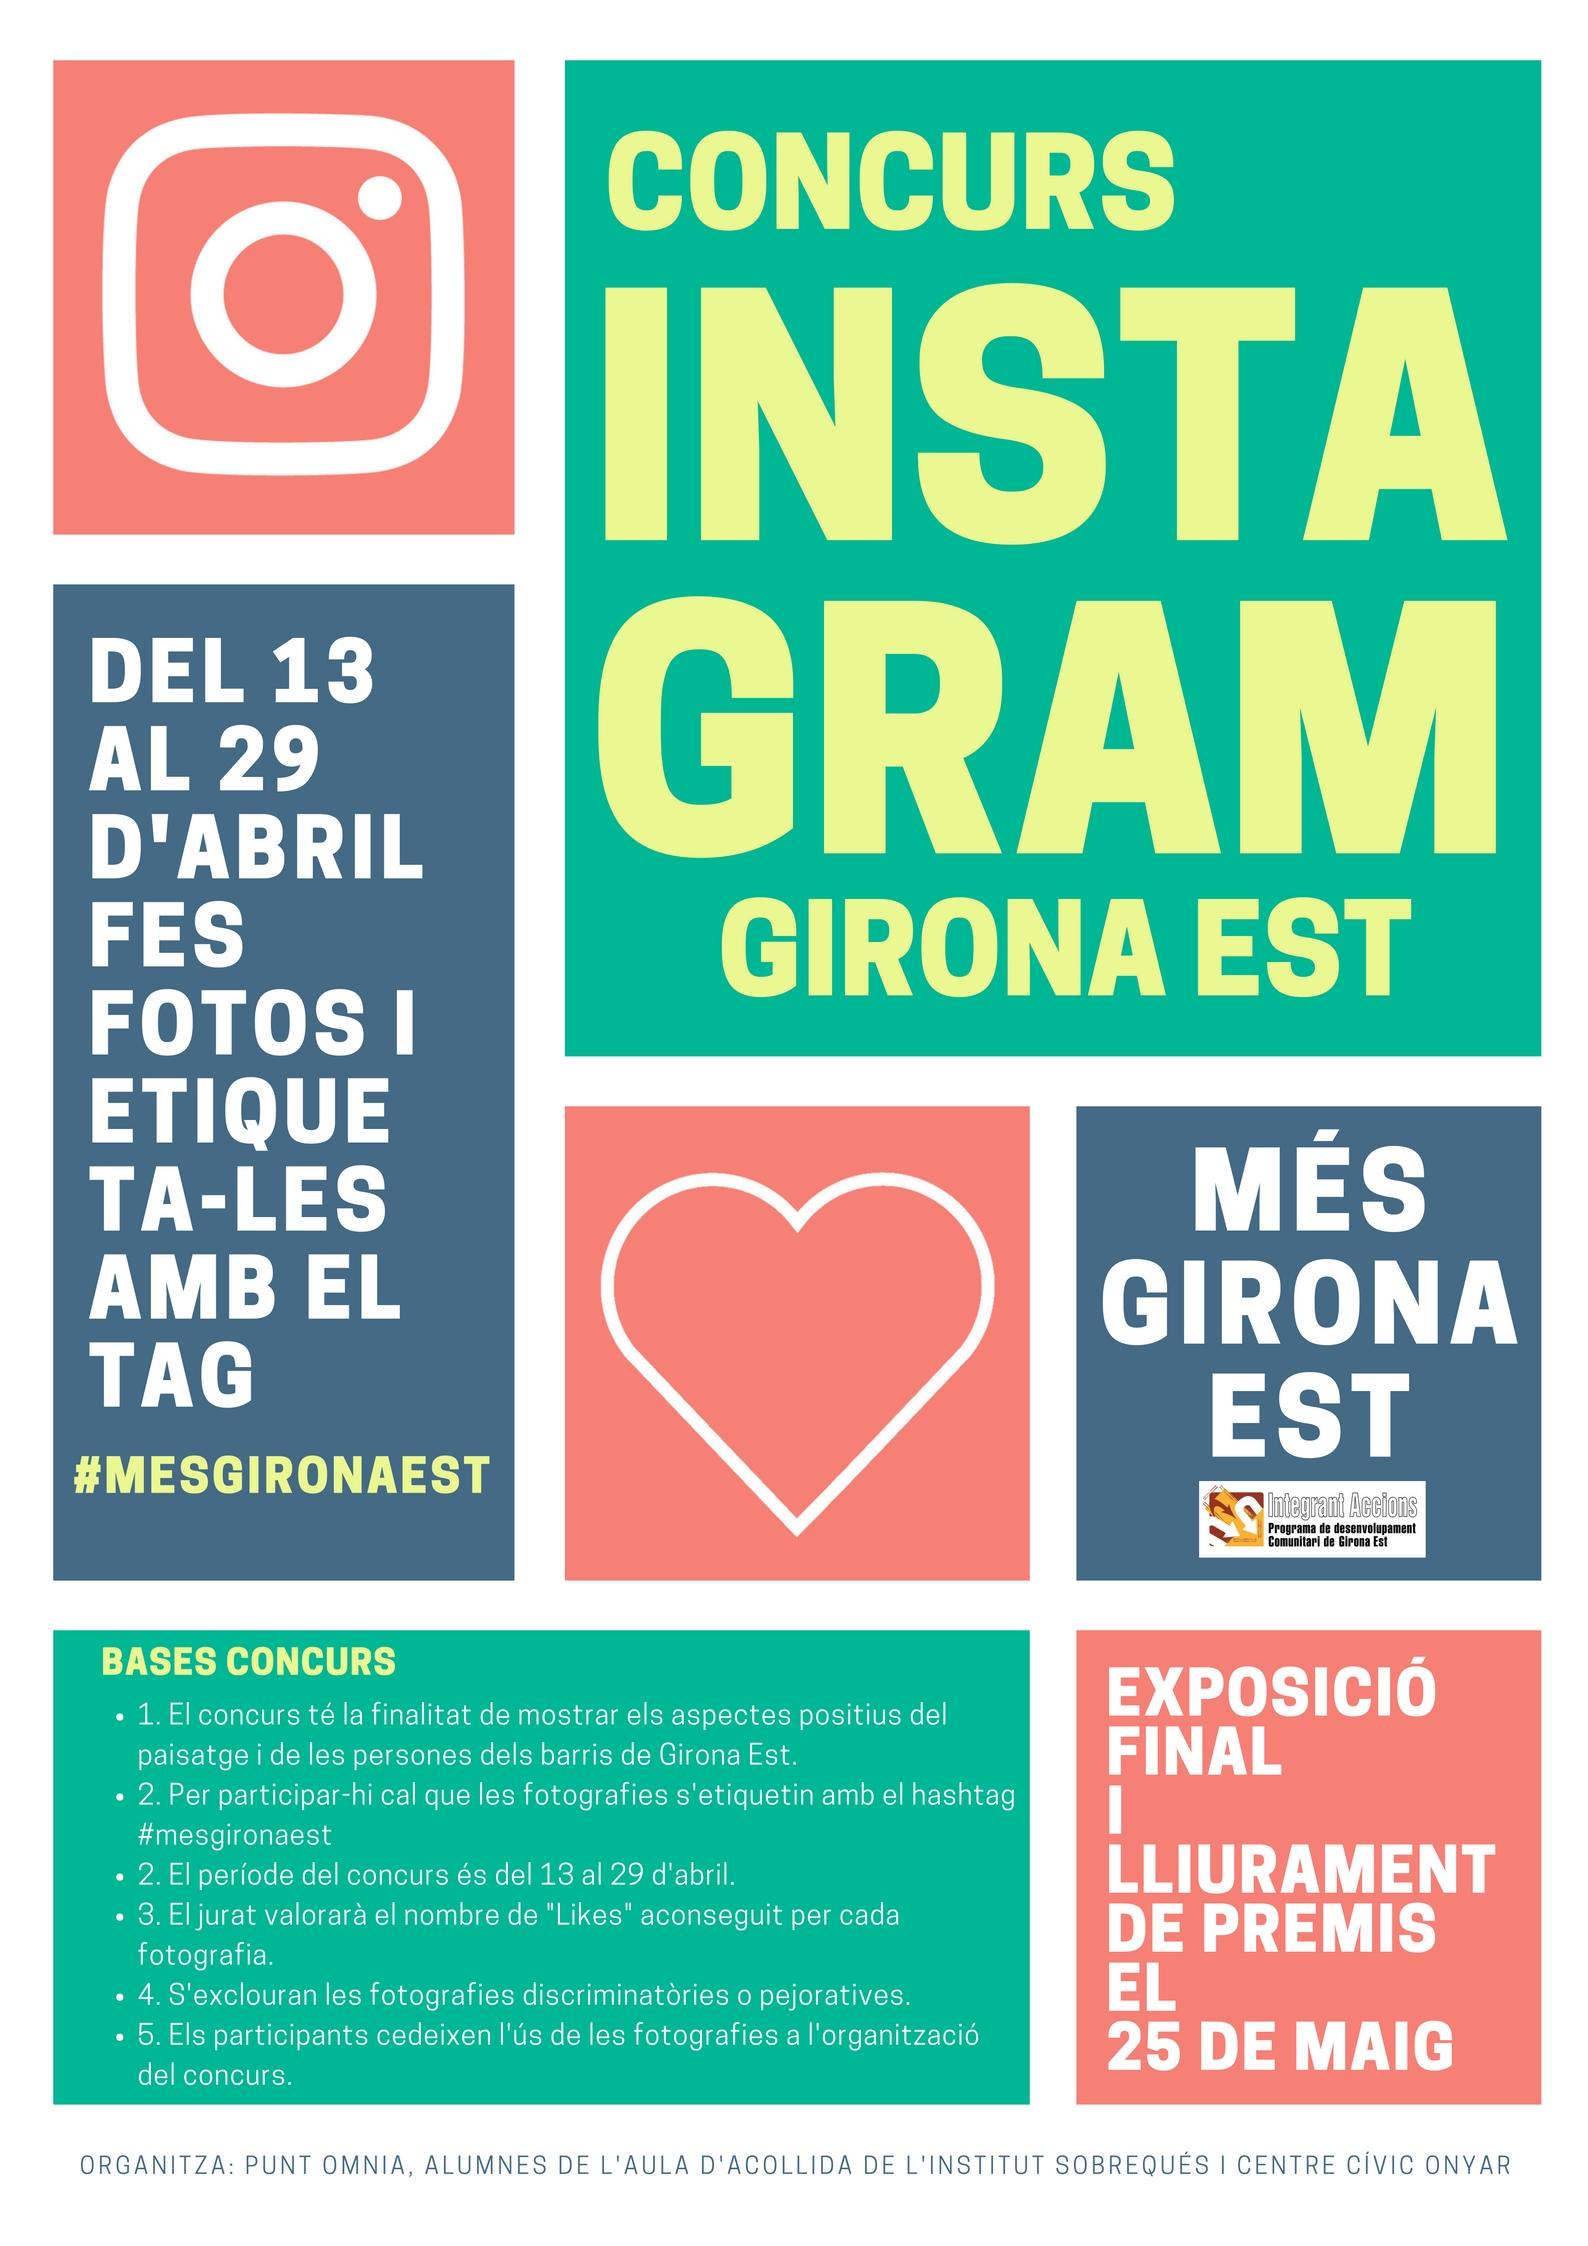 Concurs d'Instagram al Punt Òmnia Plataforma Educativa de Girona